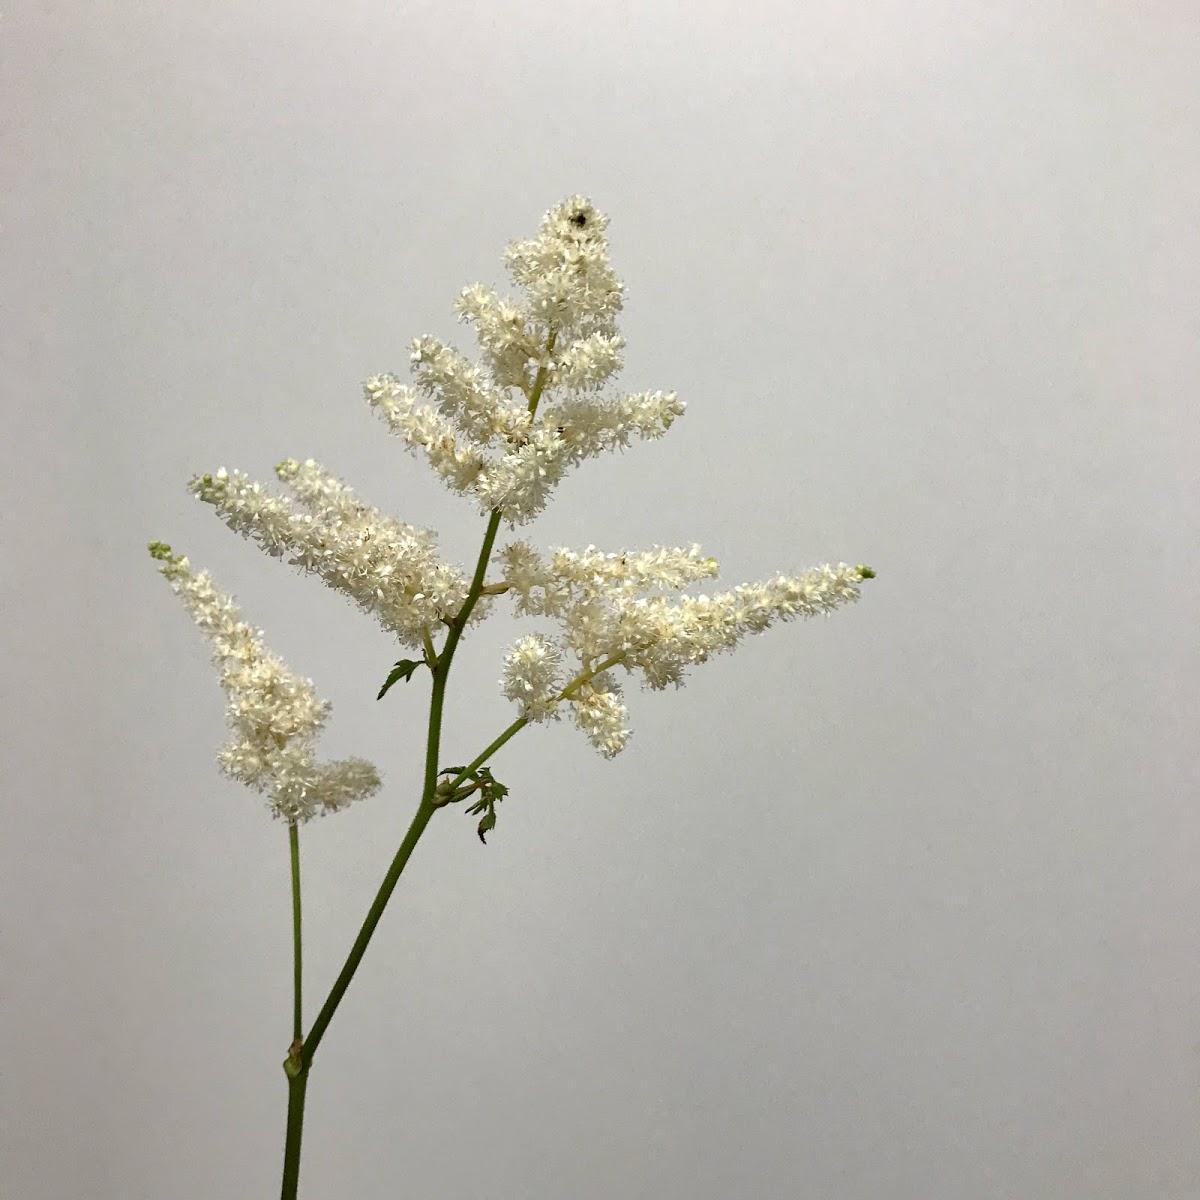 f:id:asunaro-flower:20200614040025j:plain